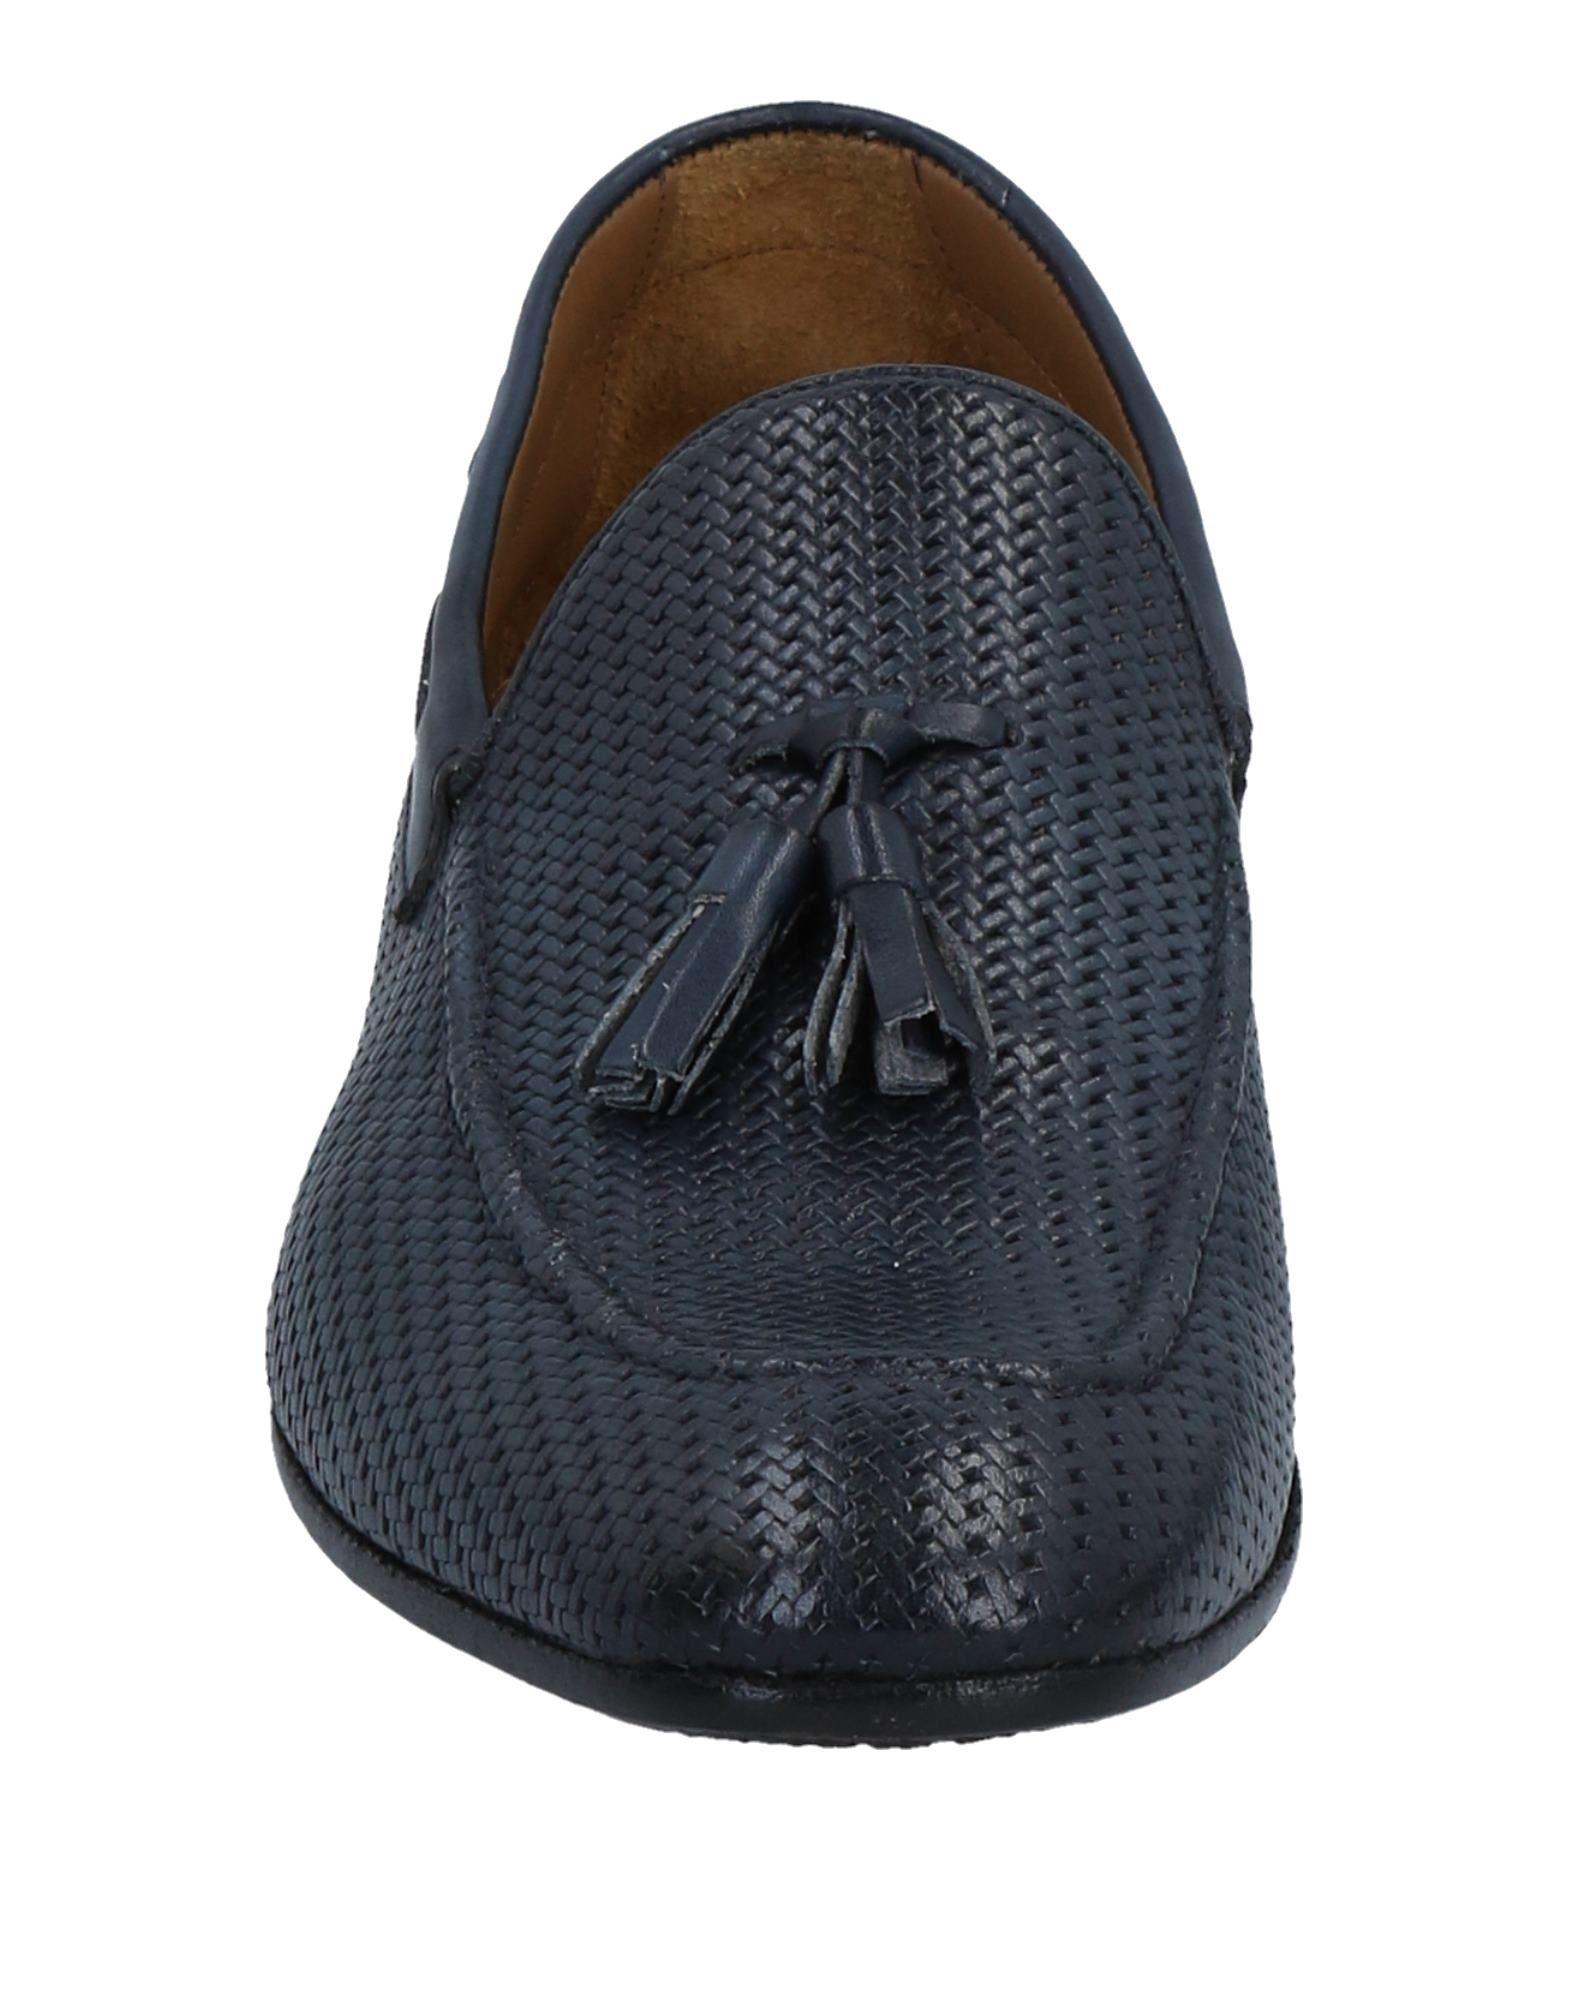 Rabatt echte Mokassins Schuhe Angelo Nardelli Mokassins echte Herren  11506254HU 5949e1